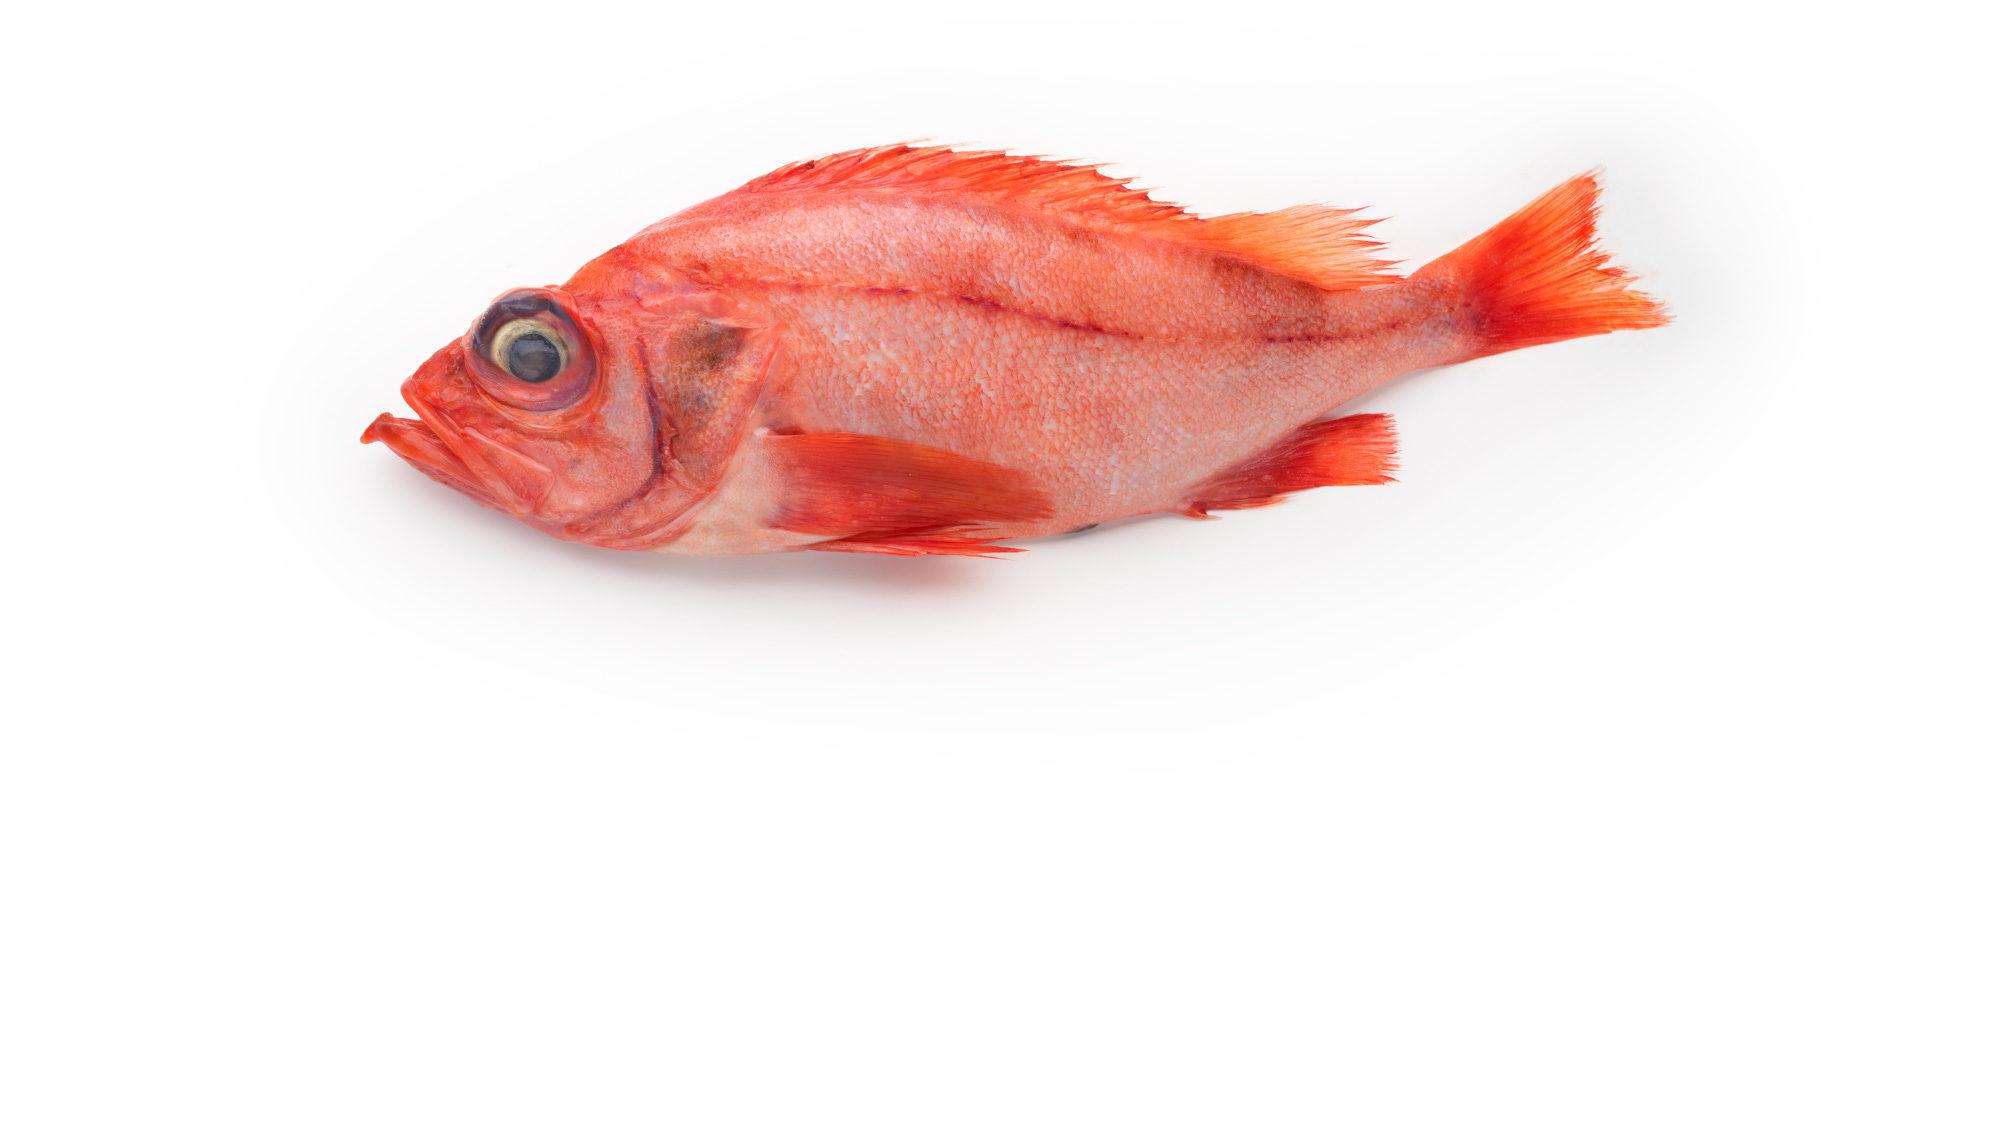 red-fish-ocean-perch-sebastes-fasciatus-sebastes-mentella